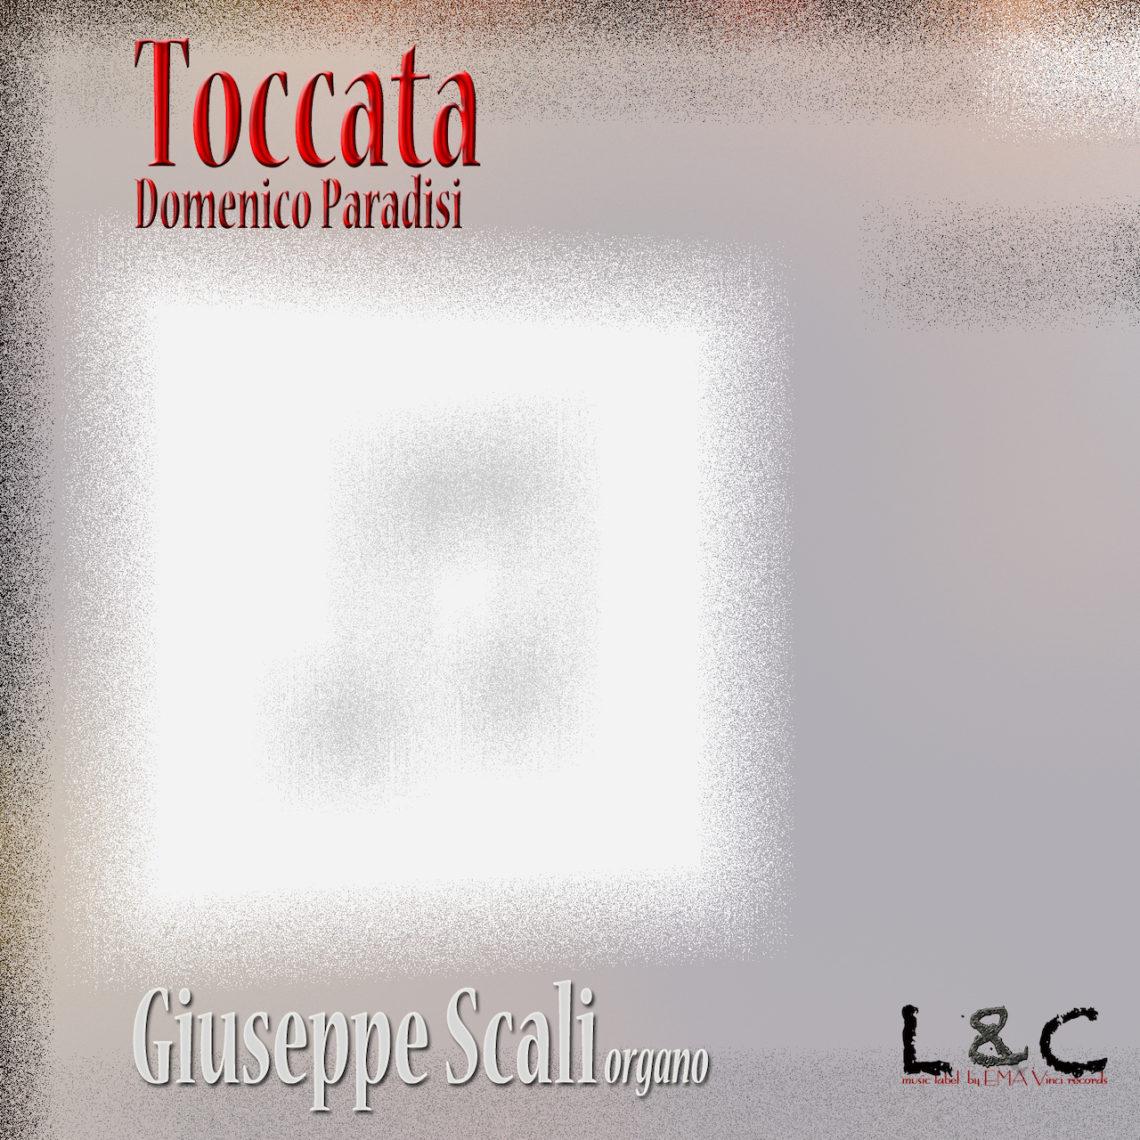 Toccata – Domenico Paradisi / Giuseppe Scali organo